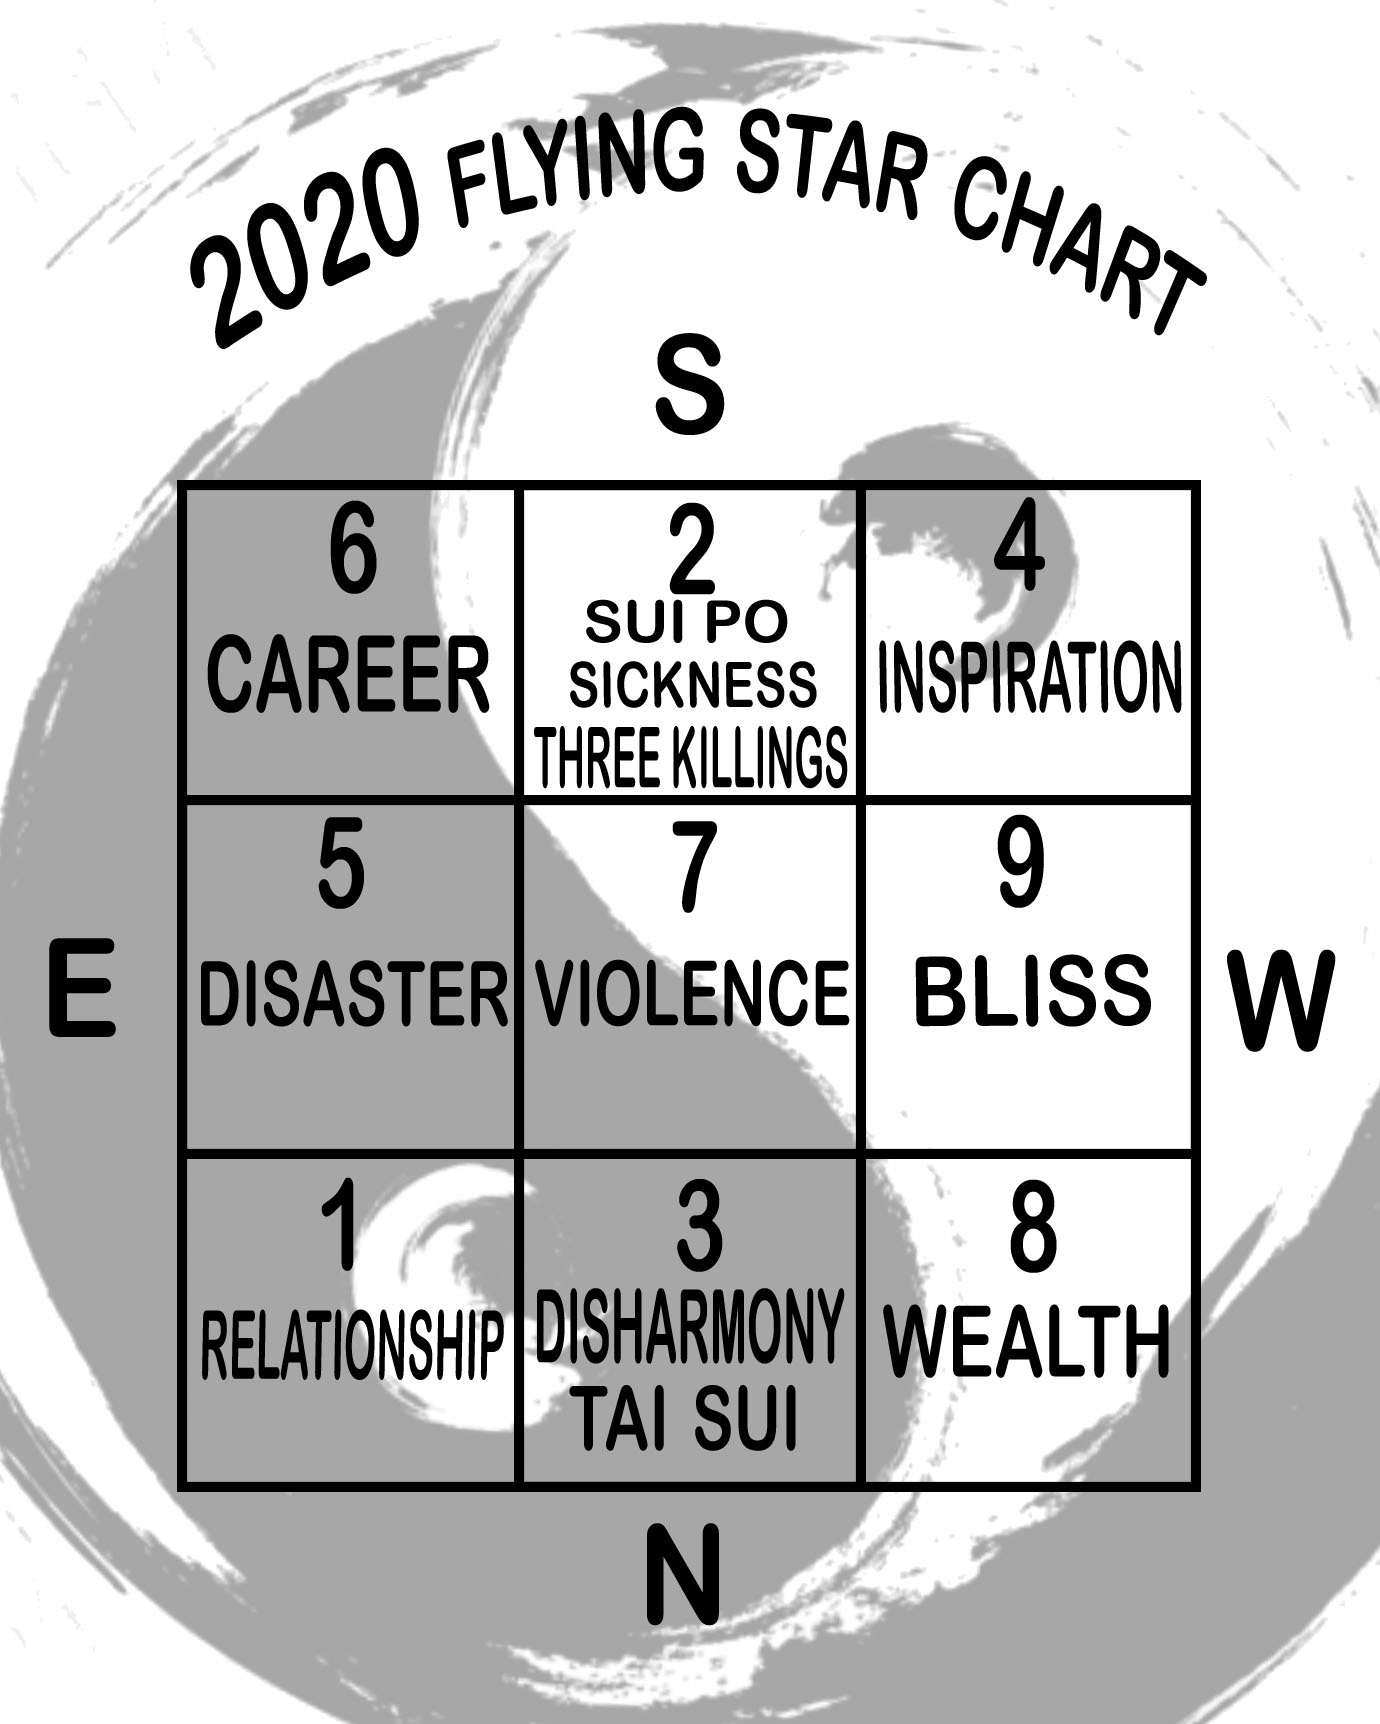 Flying Star Chart 2020